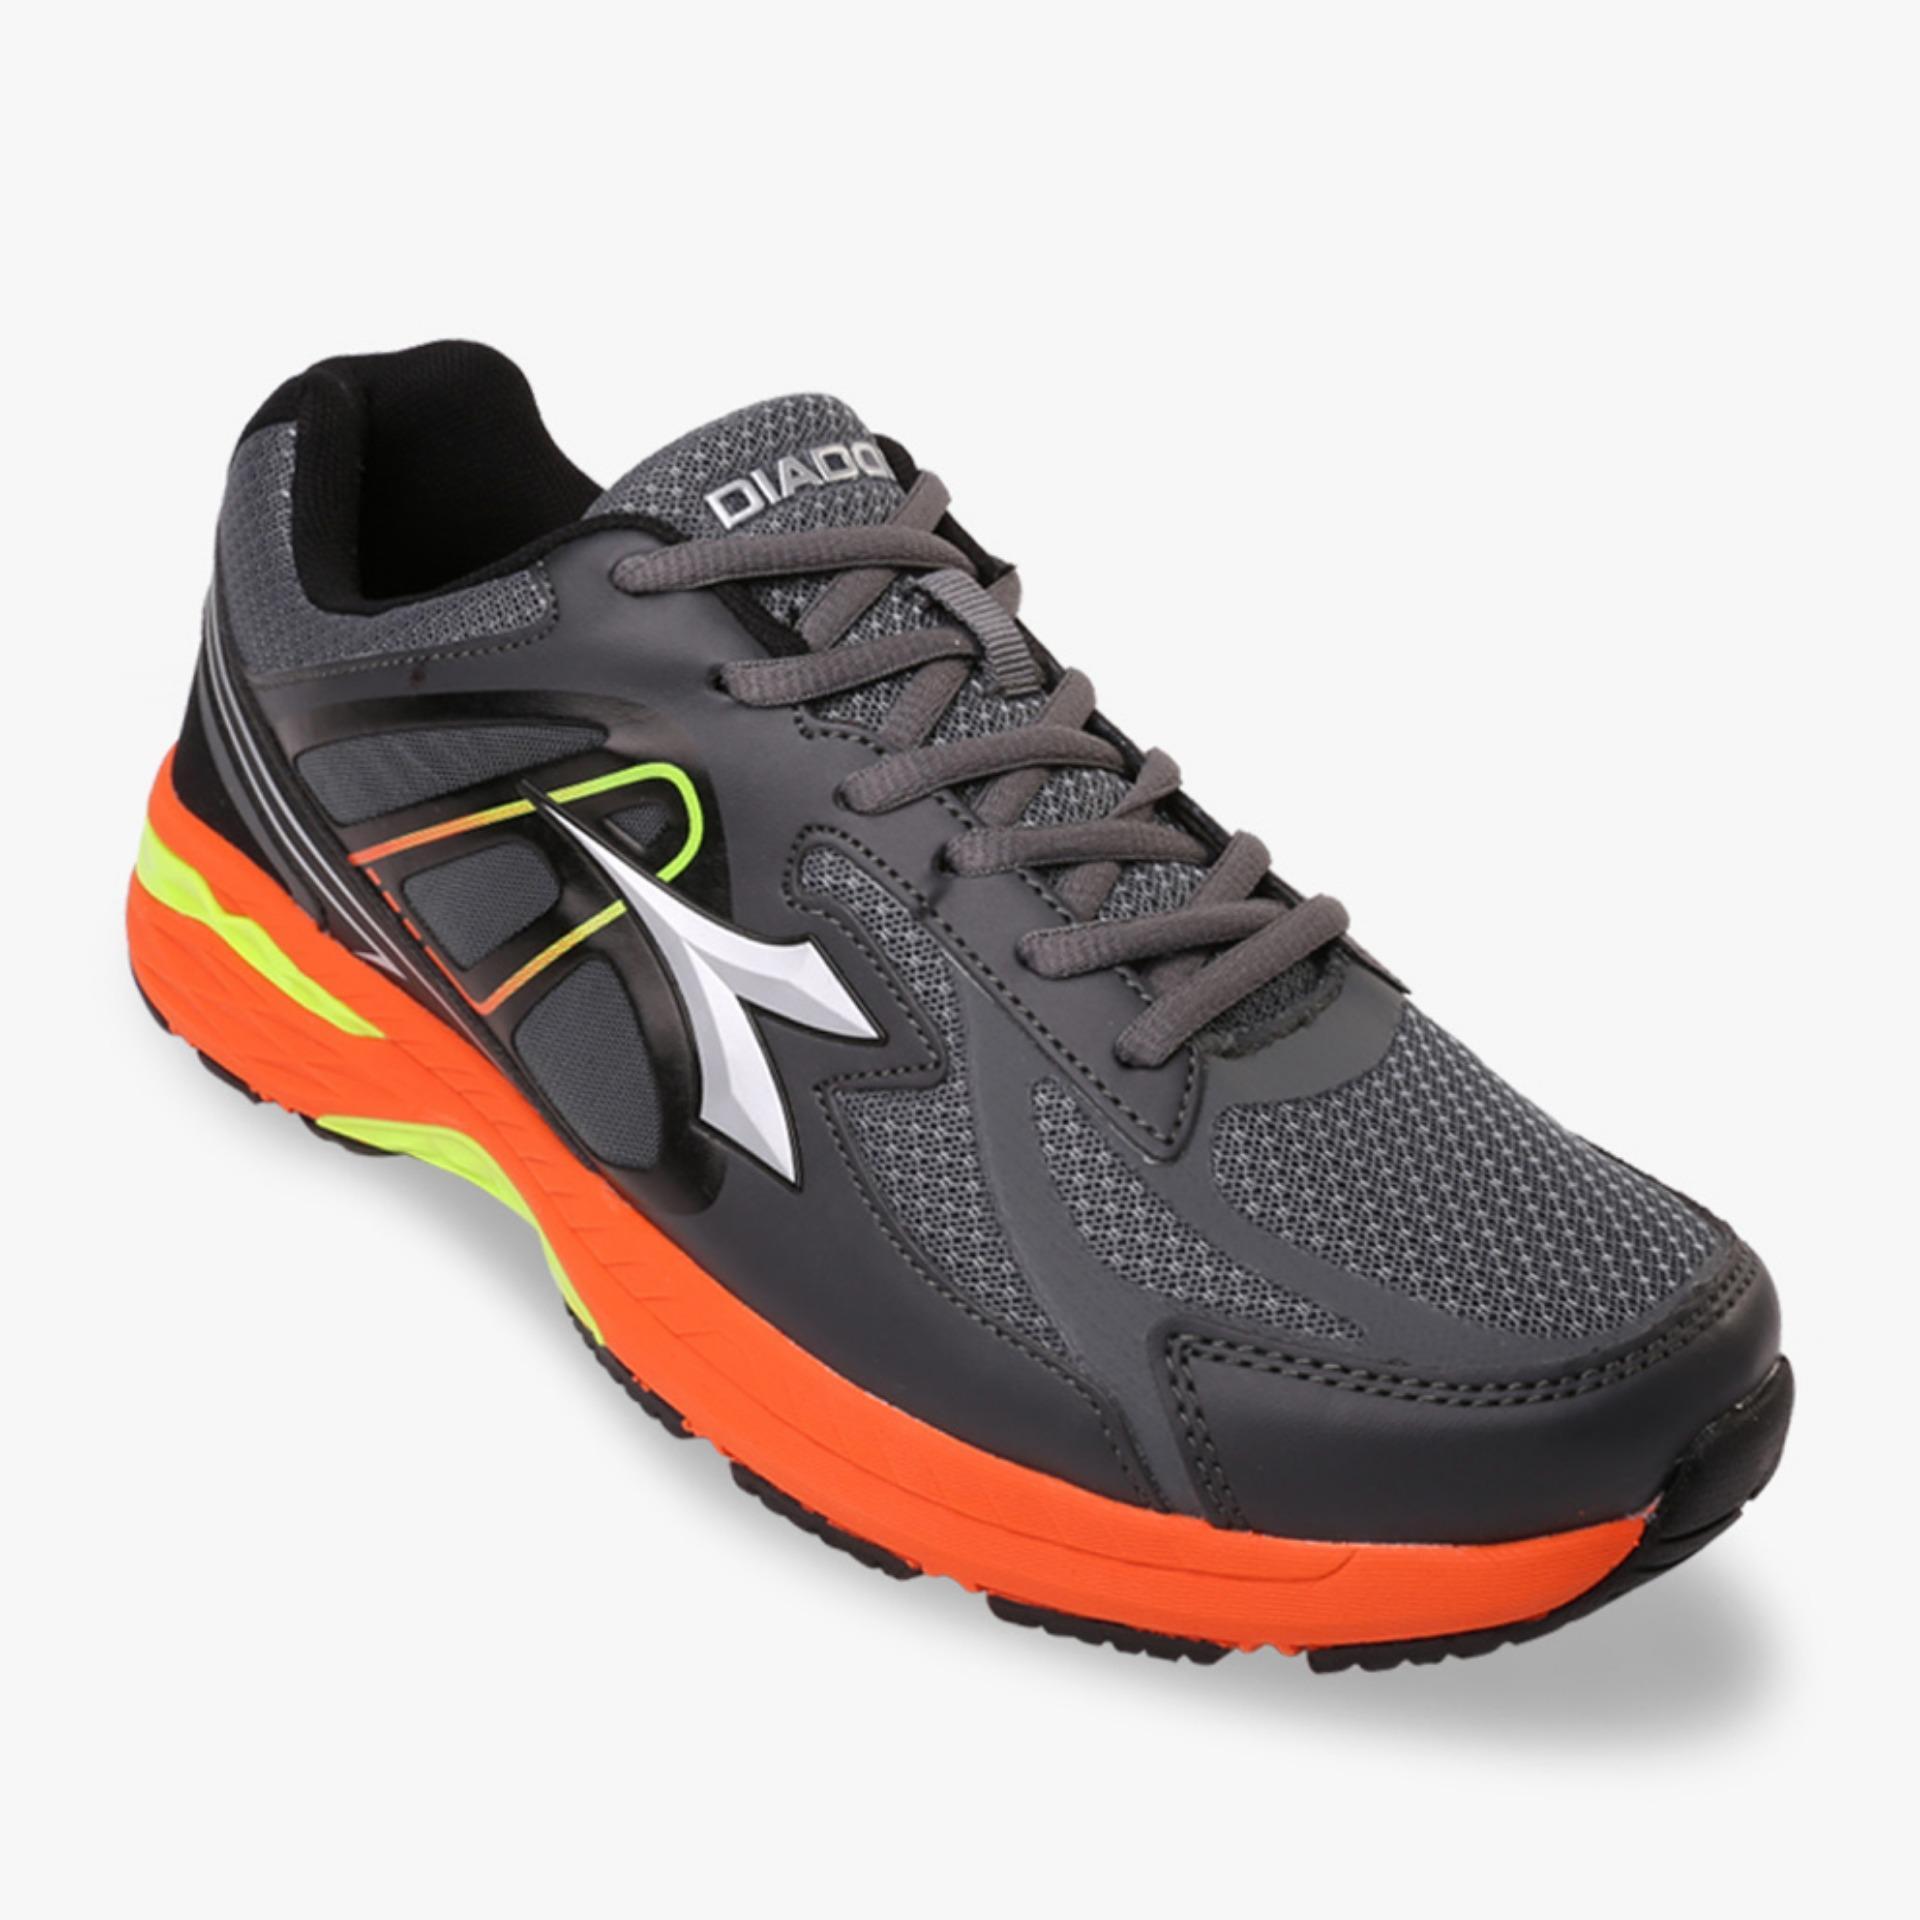 Harga Diadora Damiano Men S Running Shoes Abu Abu Branded